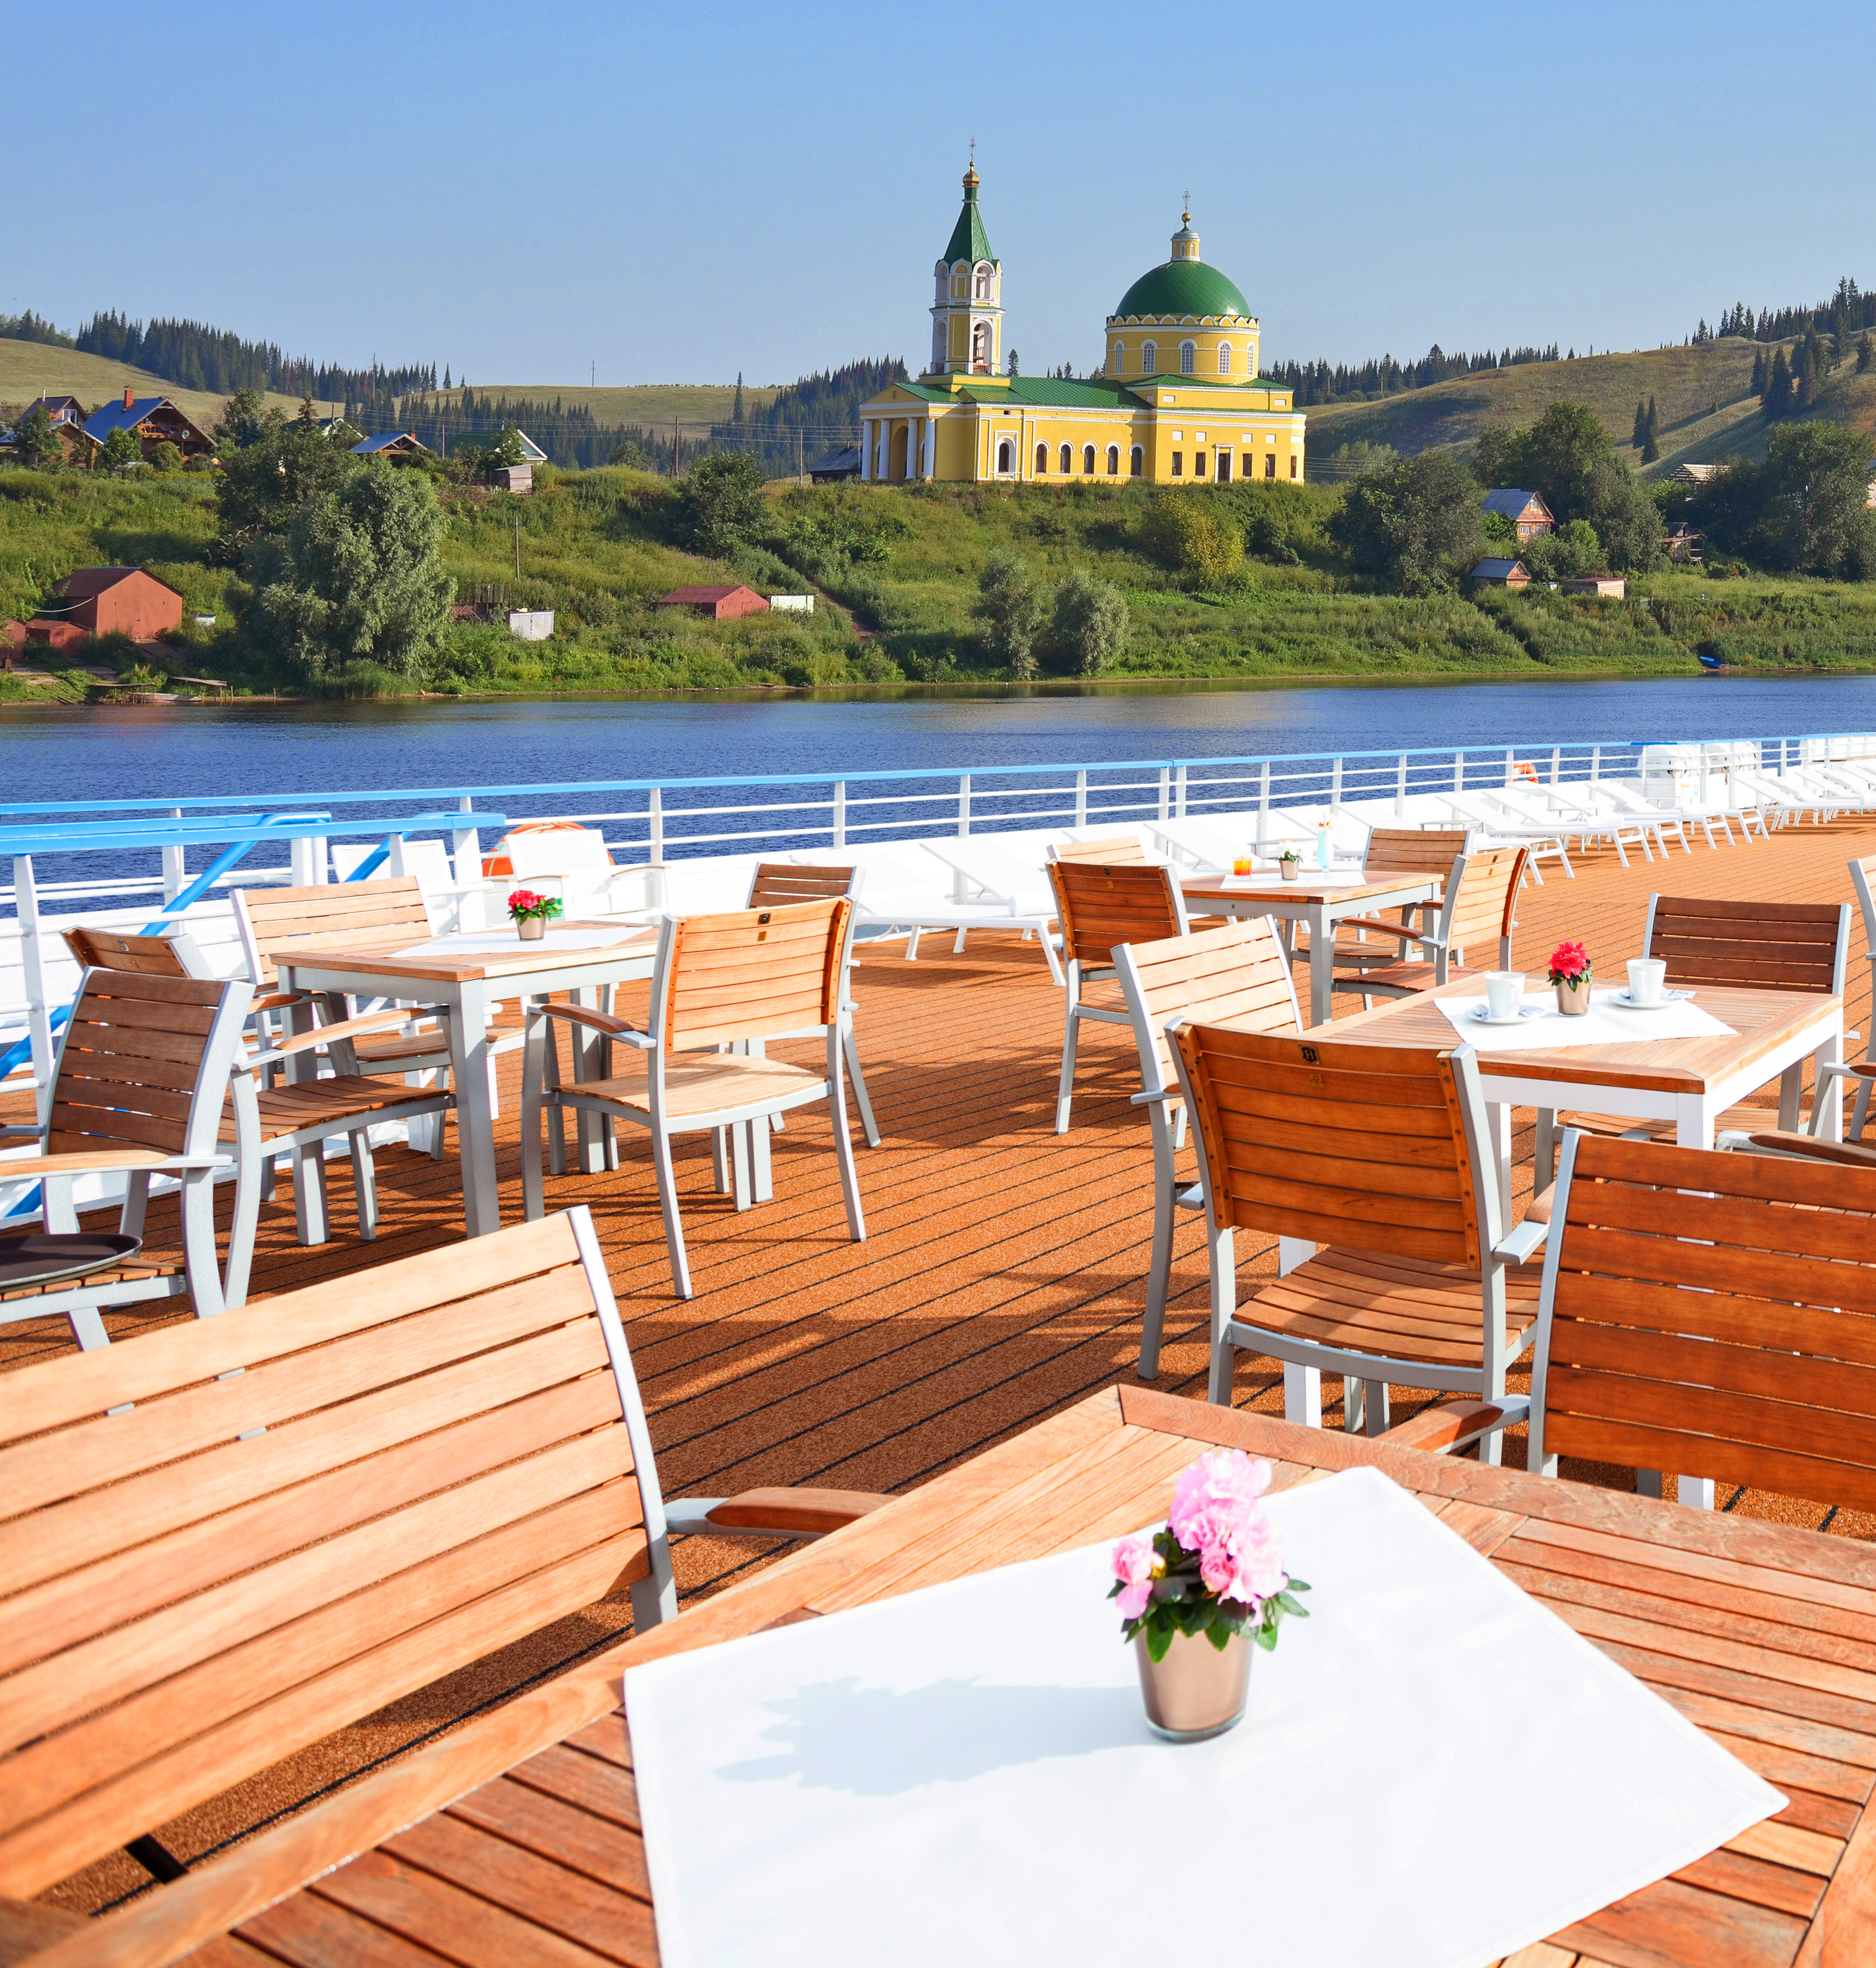 Scenic Tsar Exterior Sun Deck Tables.jpg